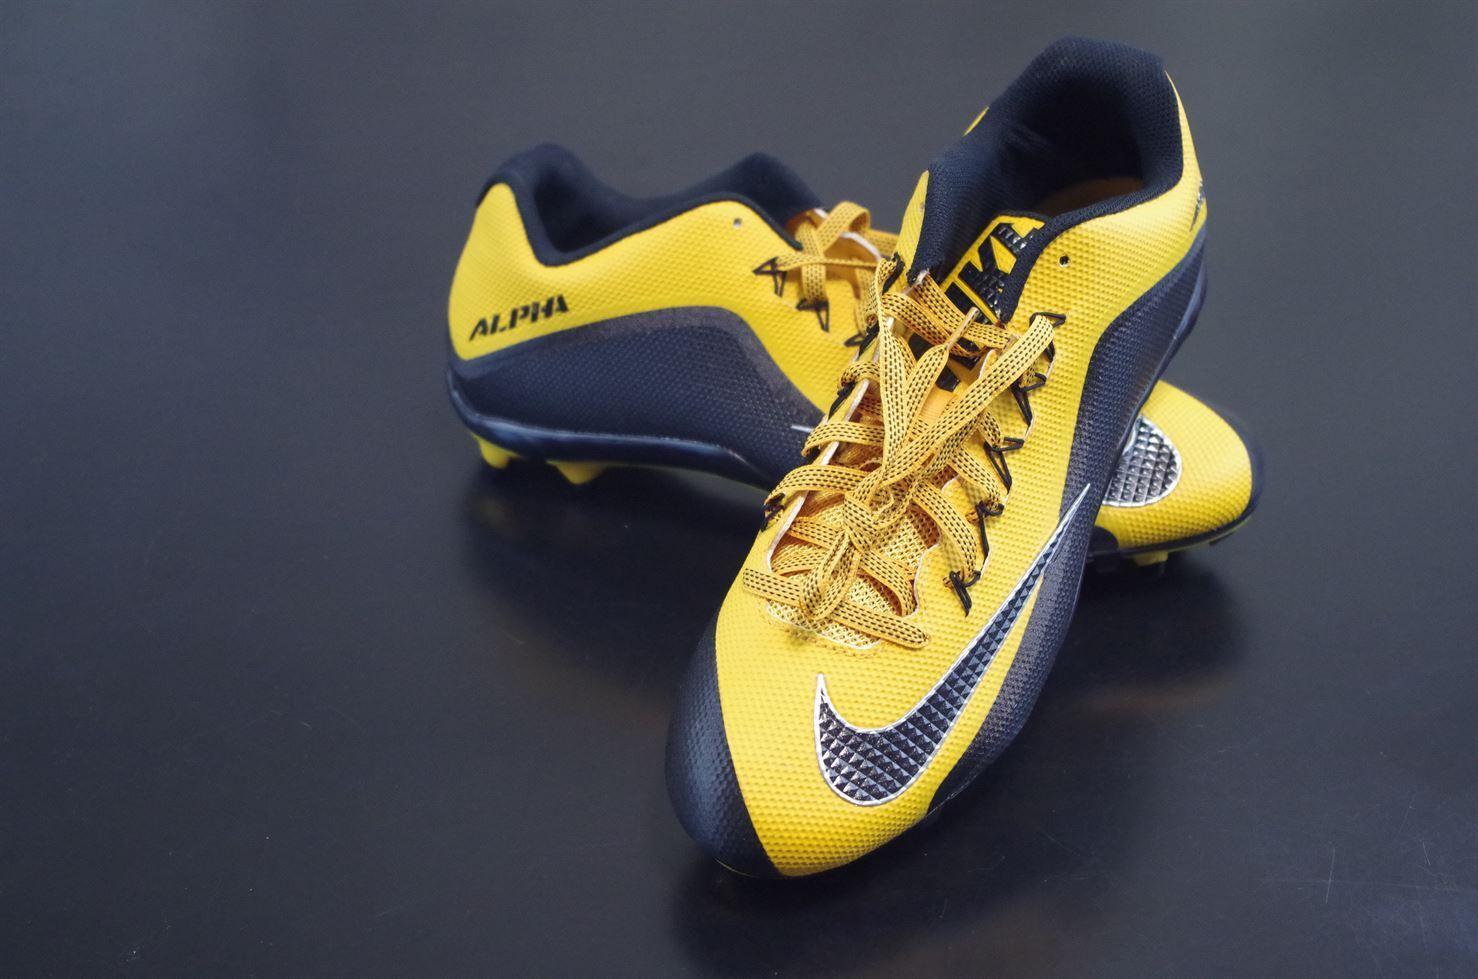 New Nike Alpha Pro 2 TD PF Football Molded Cleats shoes 729445-725 Sz 15